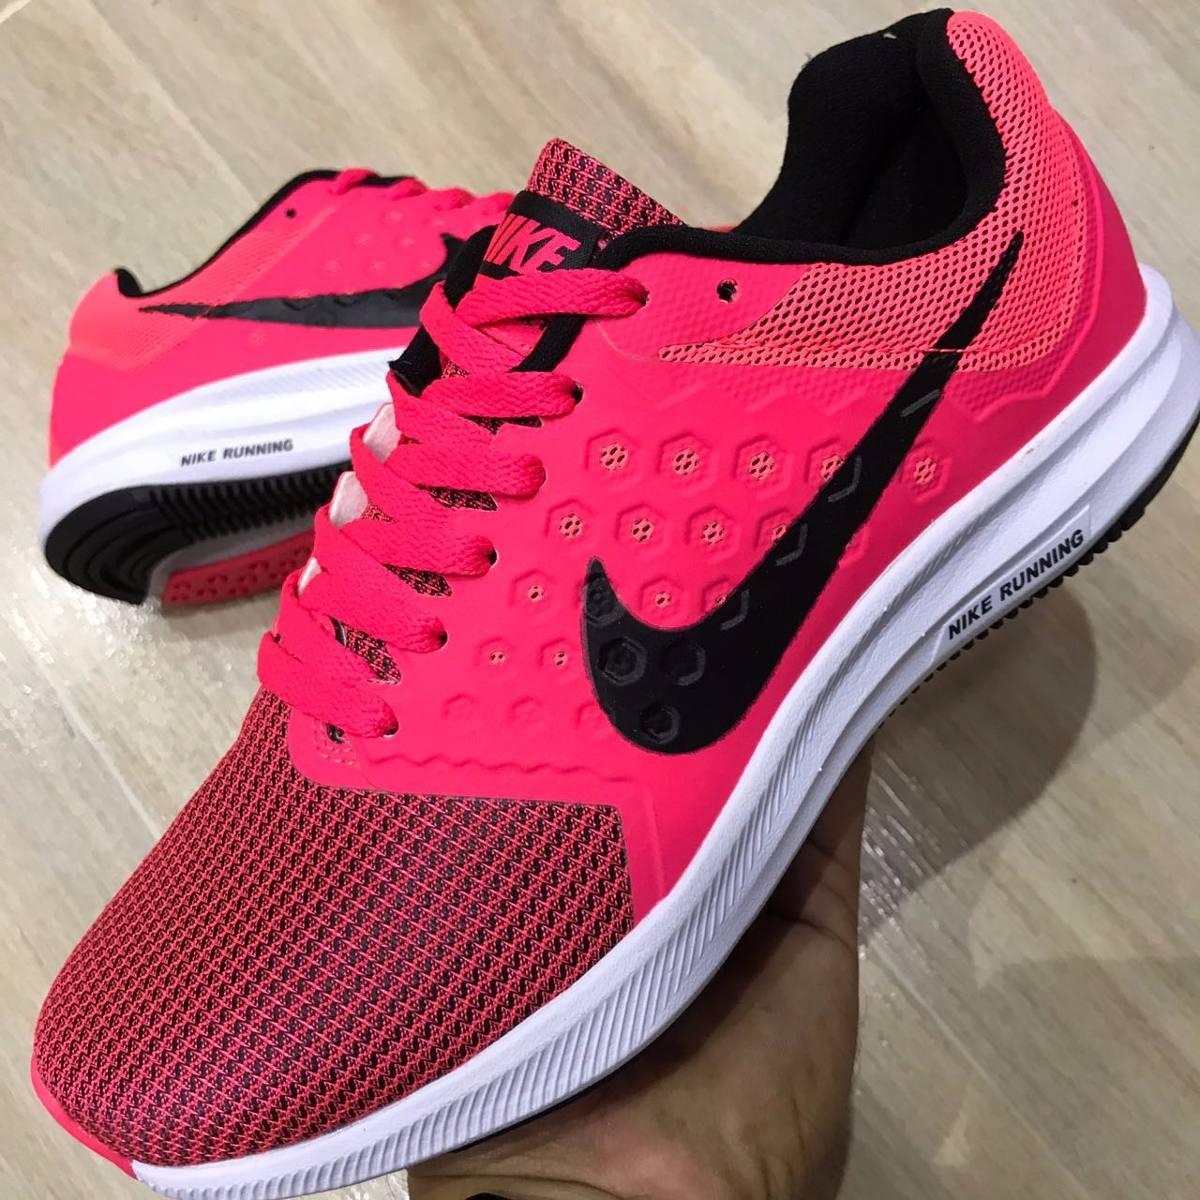 Tenis Tennis Nike Running Mujer -   168.900 en Mercado Libre efff3021fae